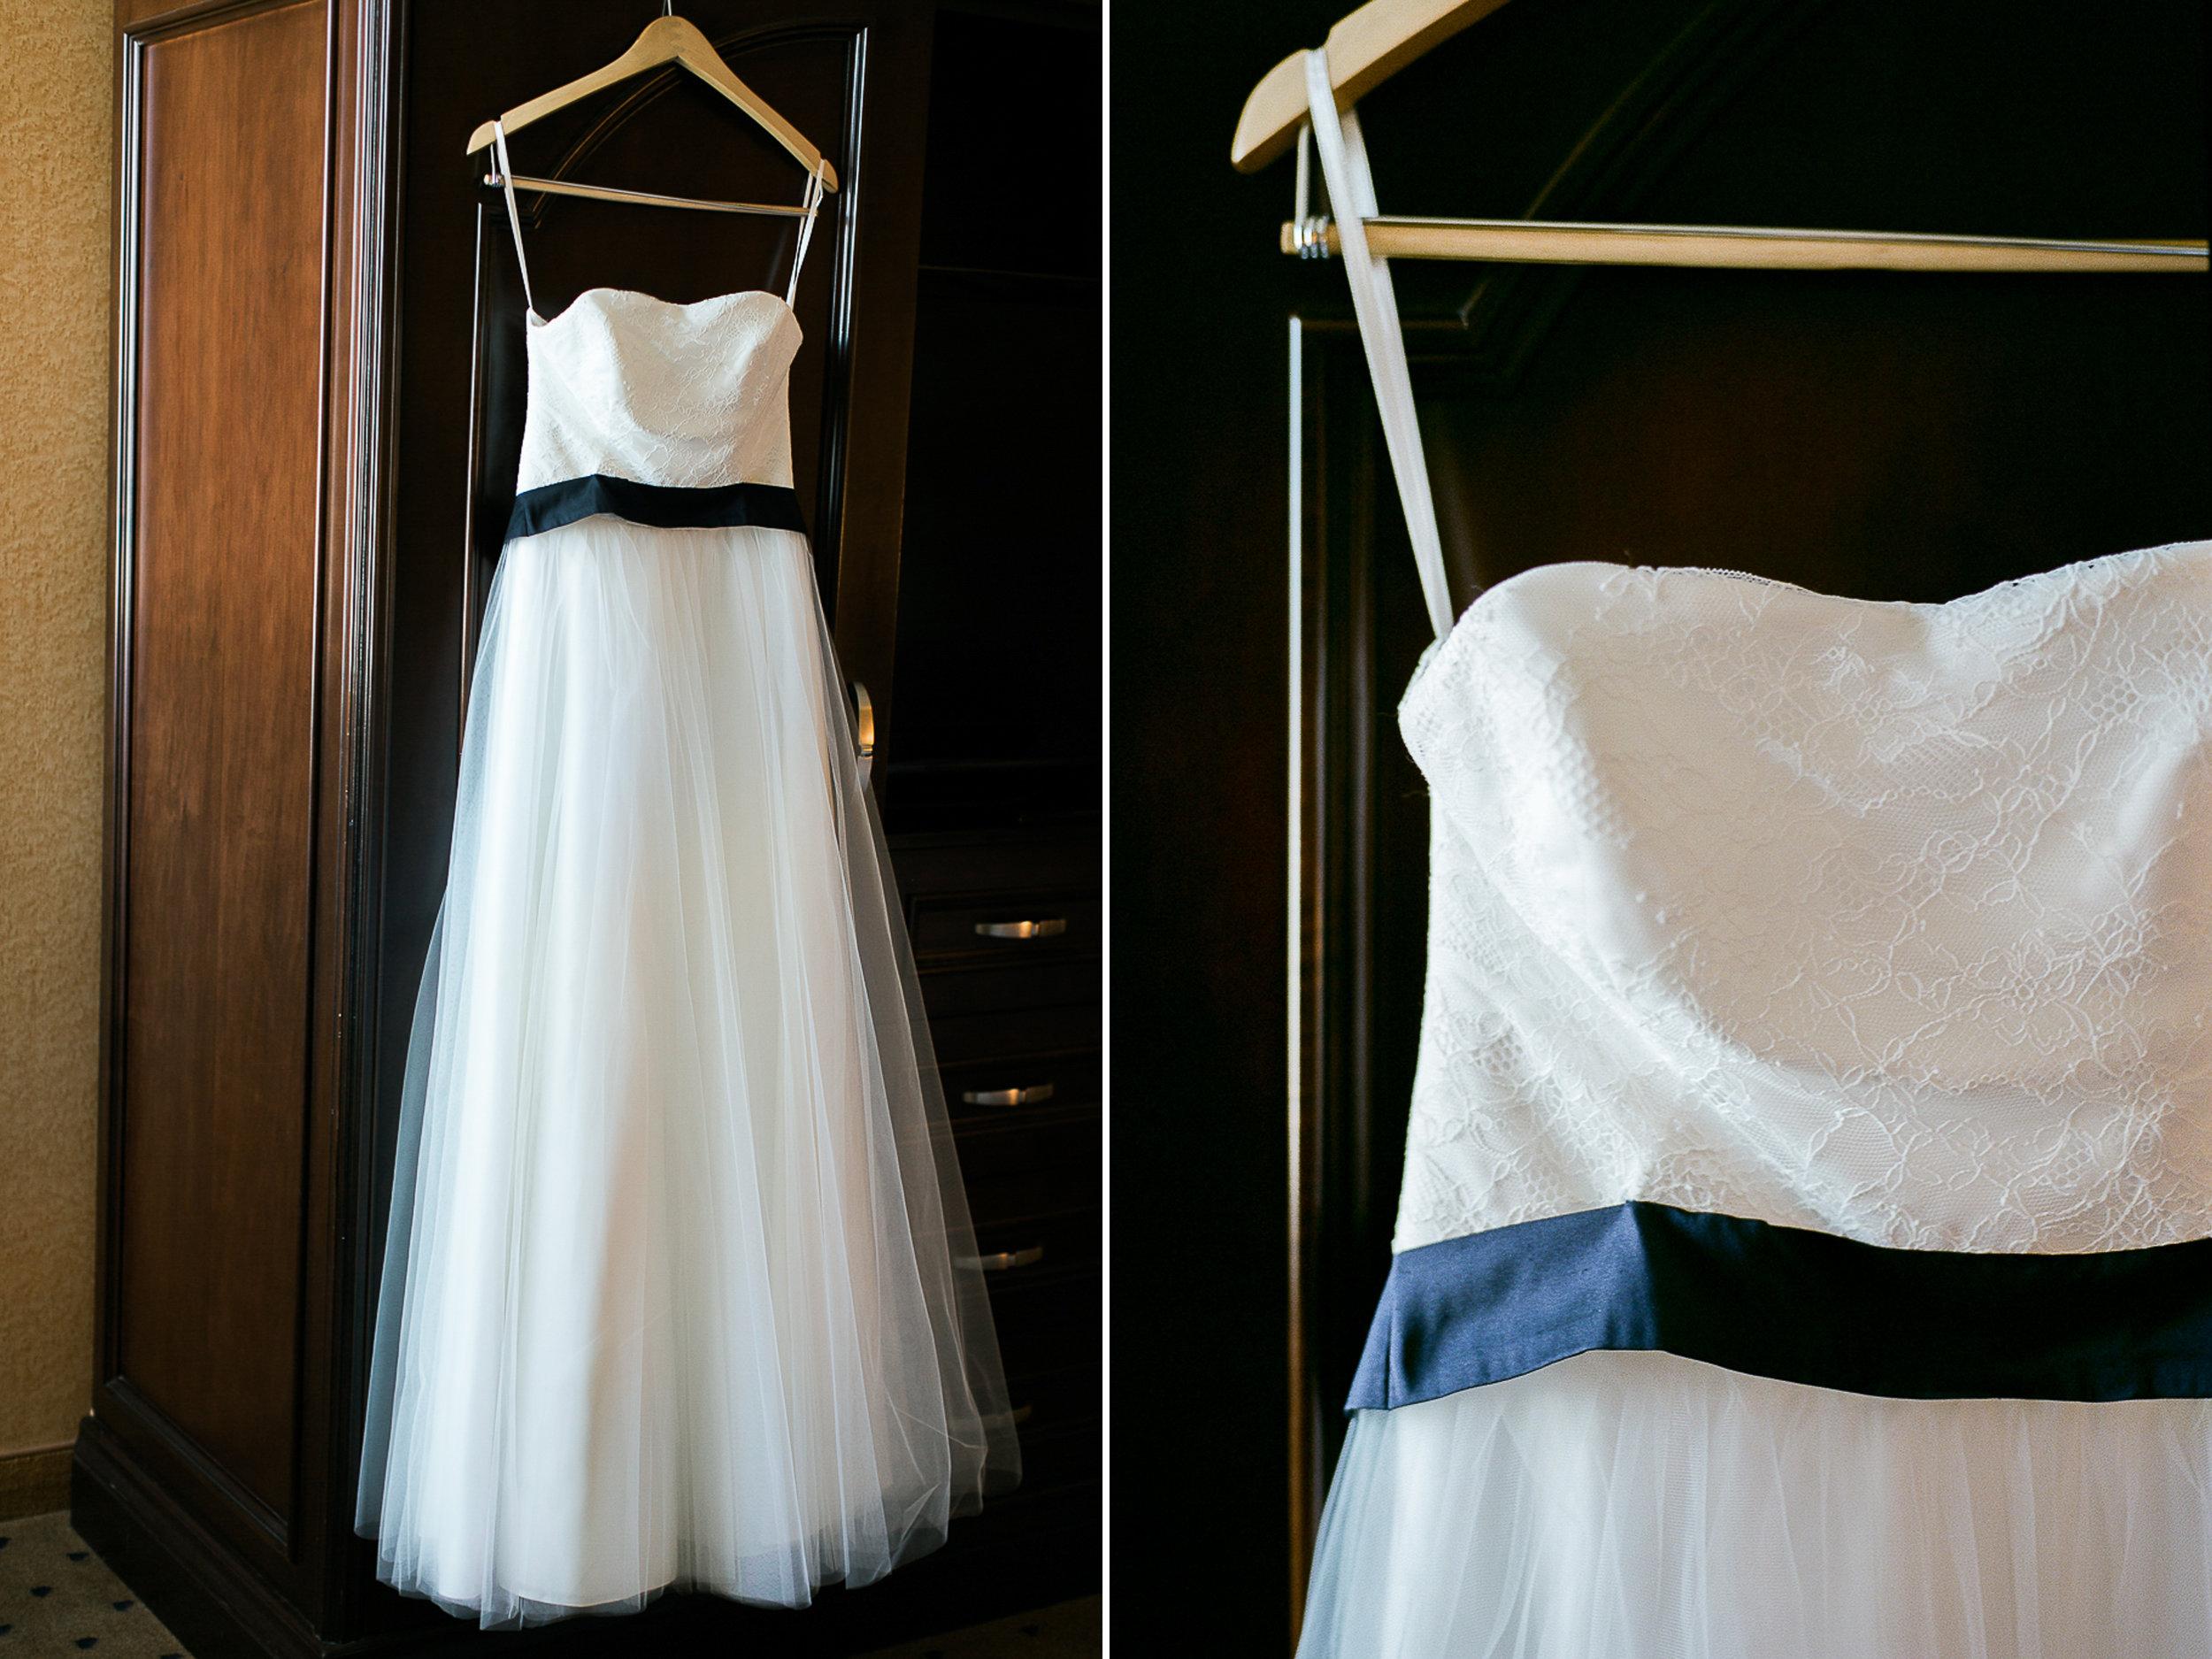 Susi-und-Danu-Hochzeit-Theresa-Pewal-Fotografie-fine-art.jpg